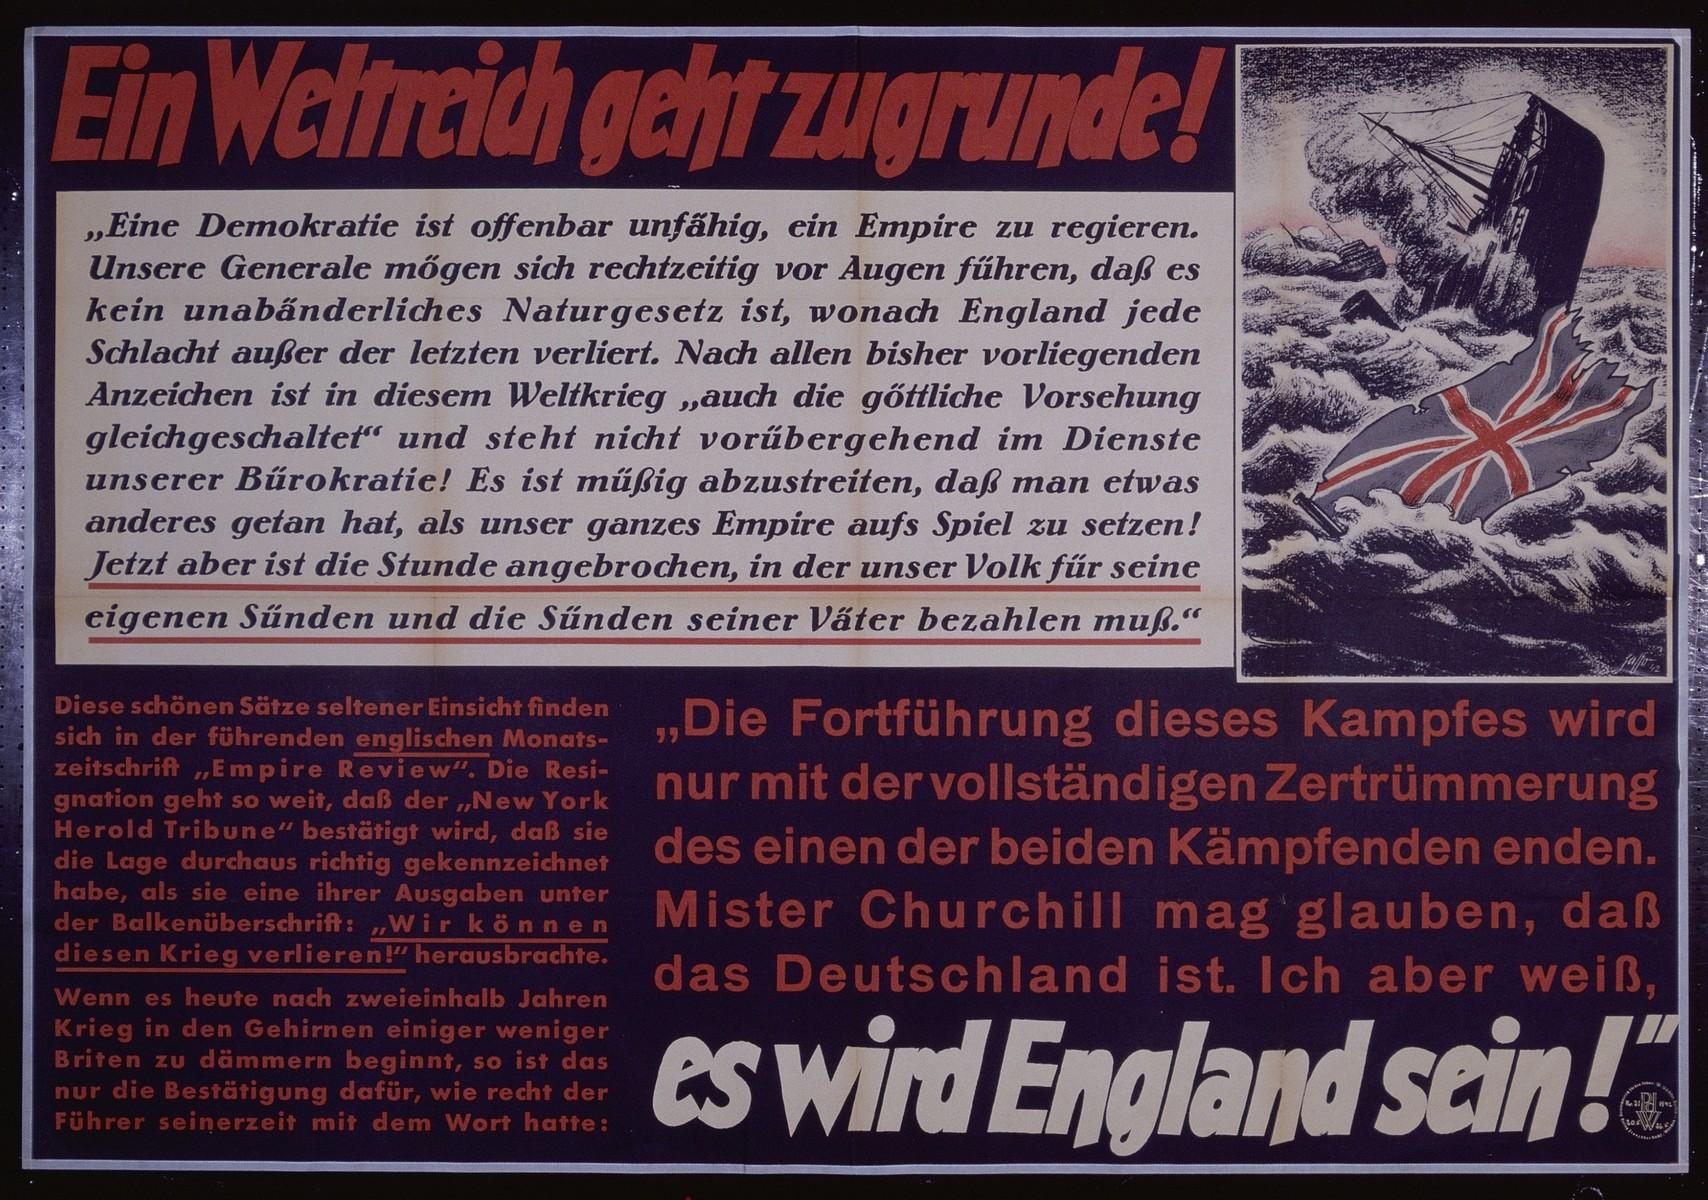 "Nazi propaganda poster entitled, ""Ein Weltreich geht zugrunde!"" issued by the ""Parole der Woche,"" a wall newspaper (Wandzeitung) published by the National Socialist Party propaganda office in Munich."